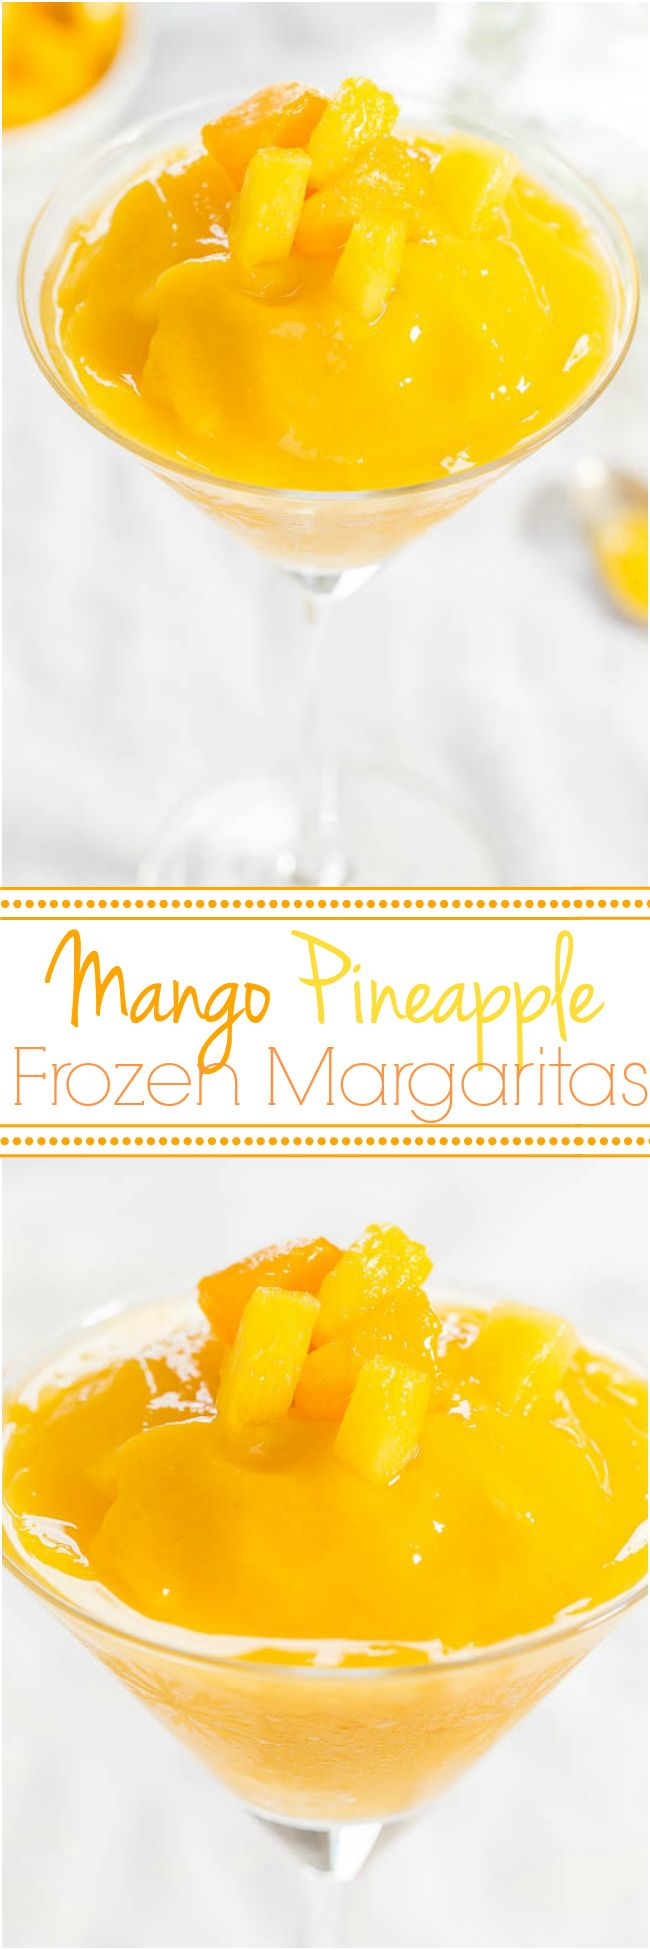 Mango Pineapple Frozen Margaritas..!!